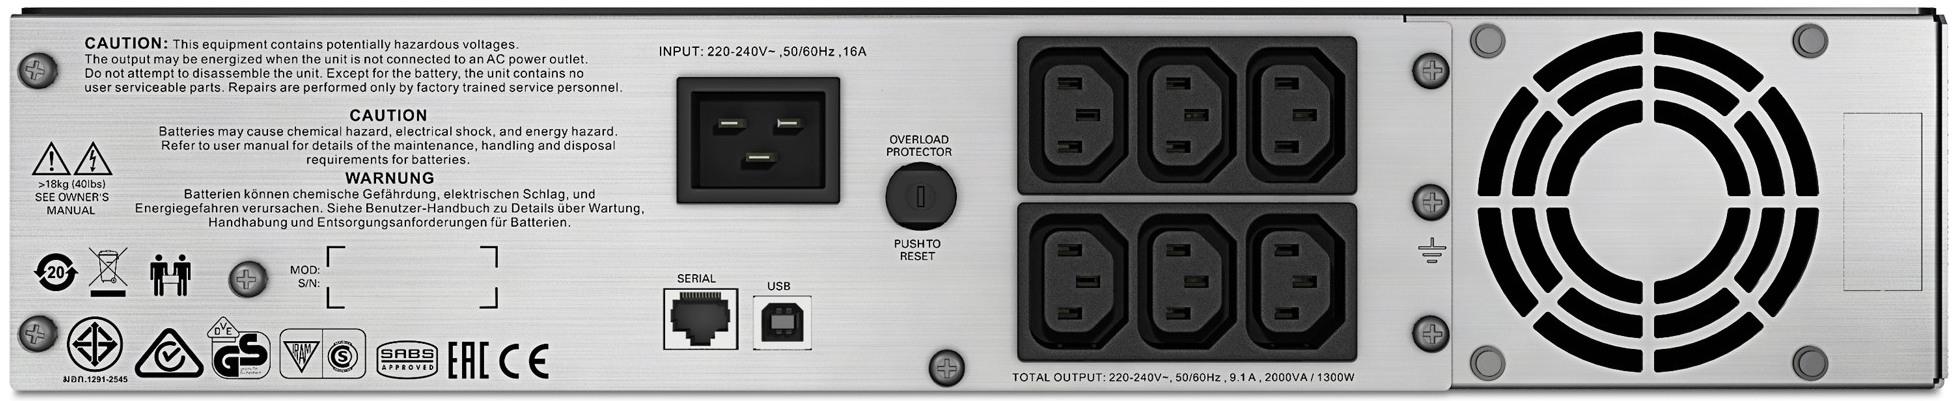 APC-by-Schneider-Electric-Smart-UPS-SMC2000I-2U-Rear